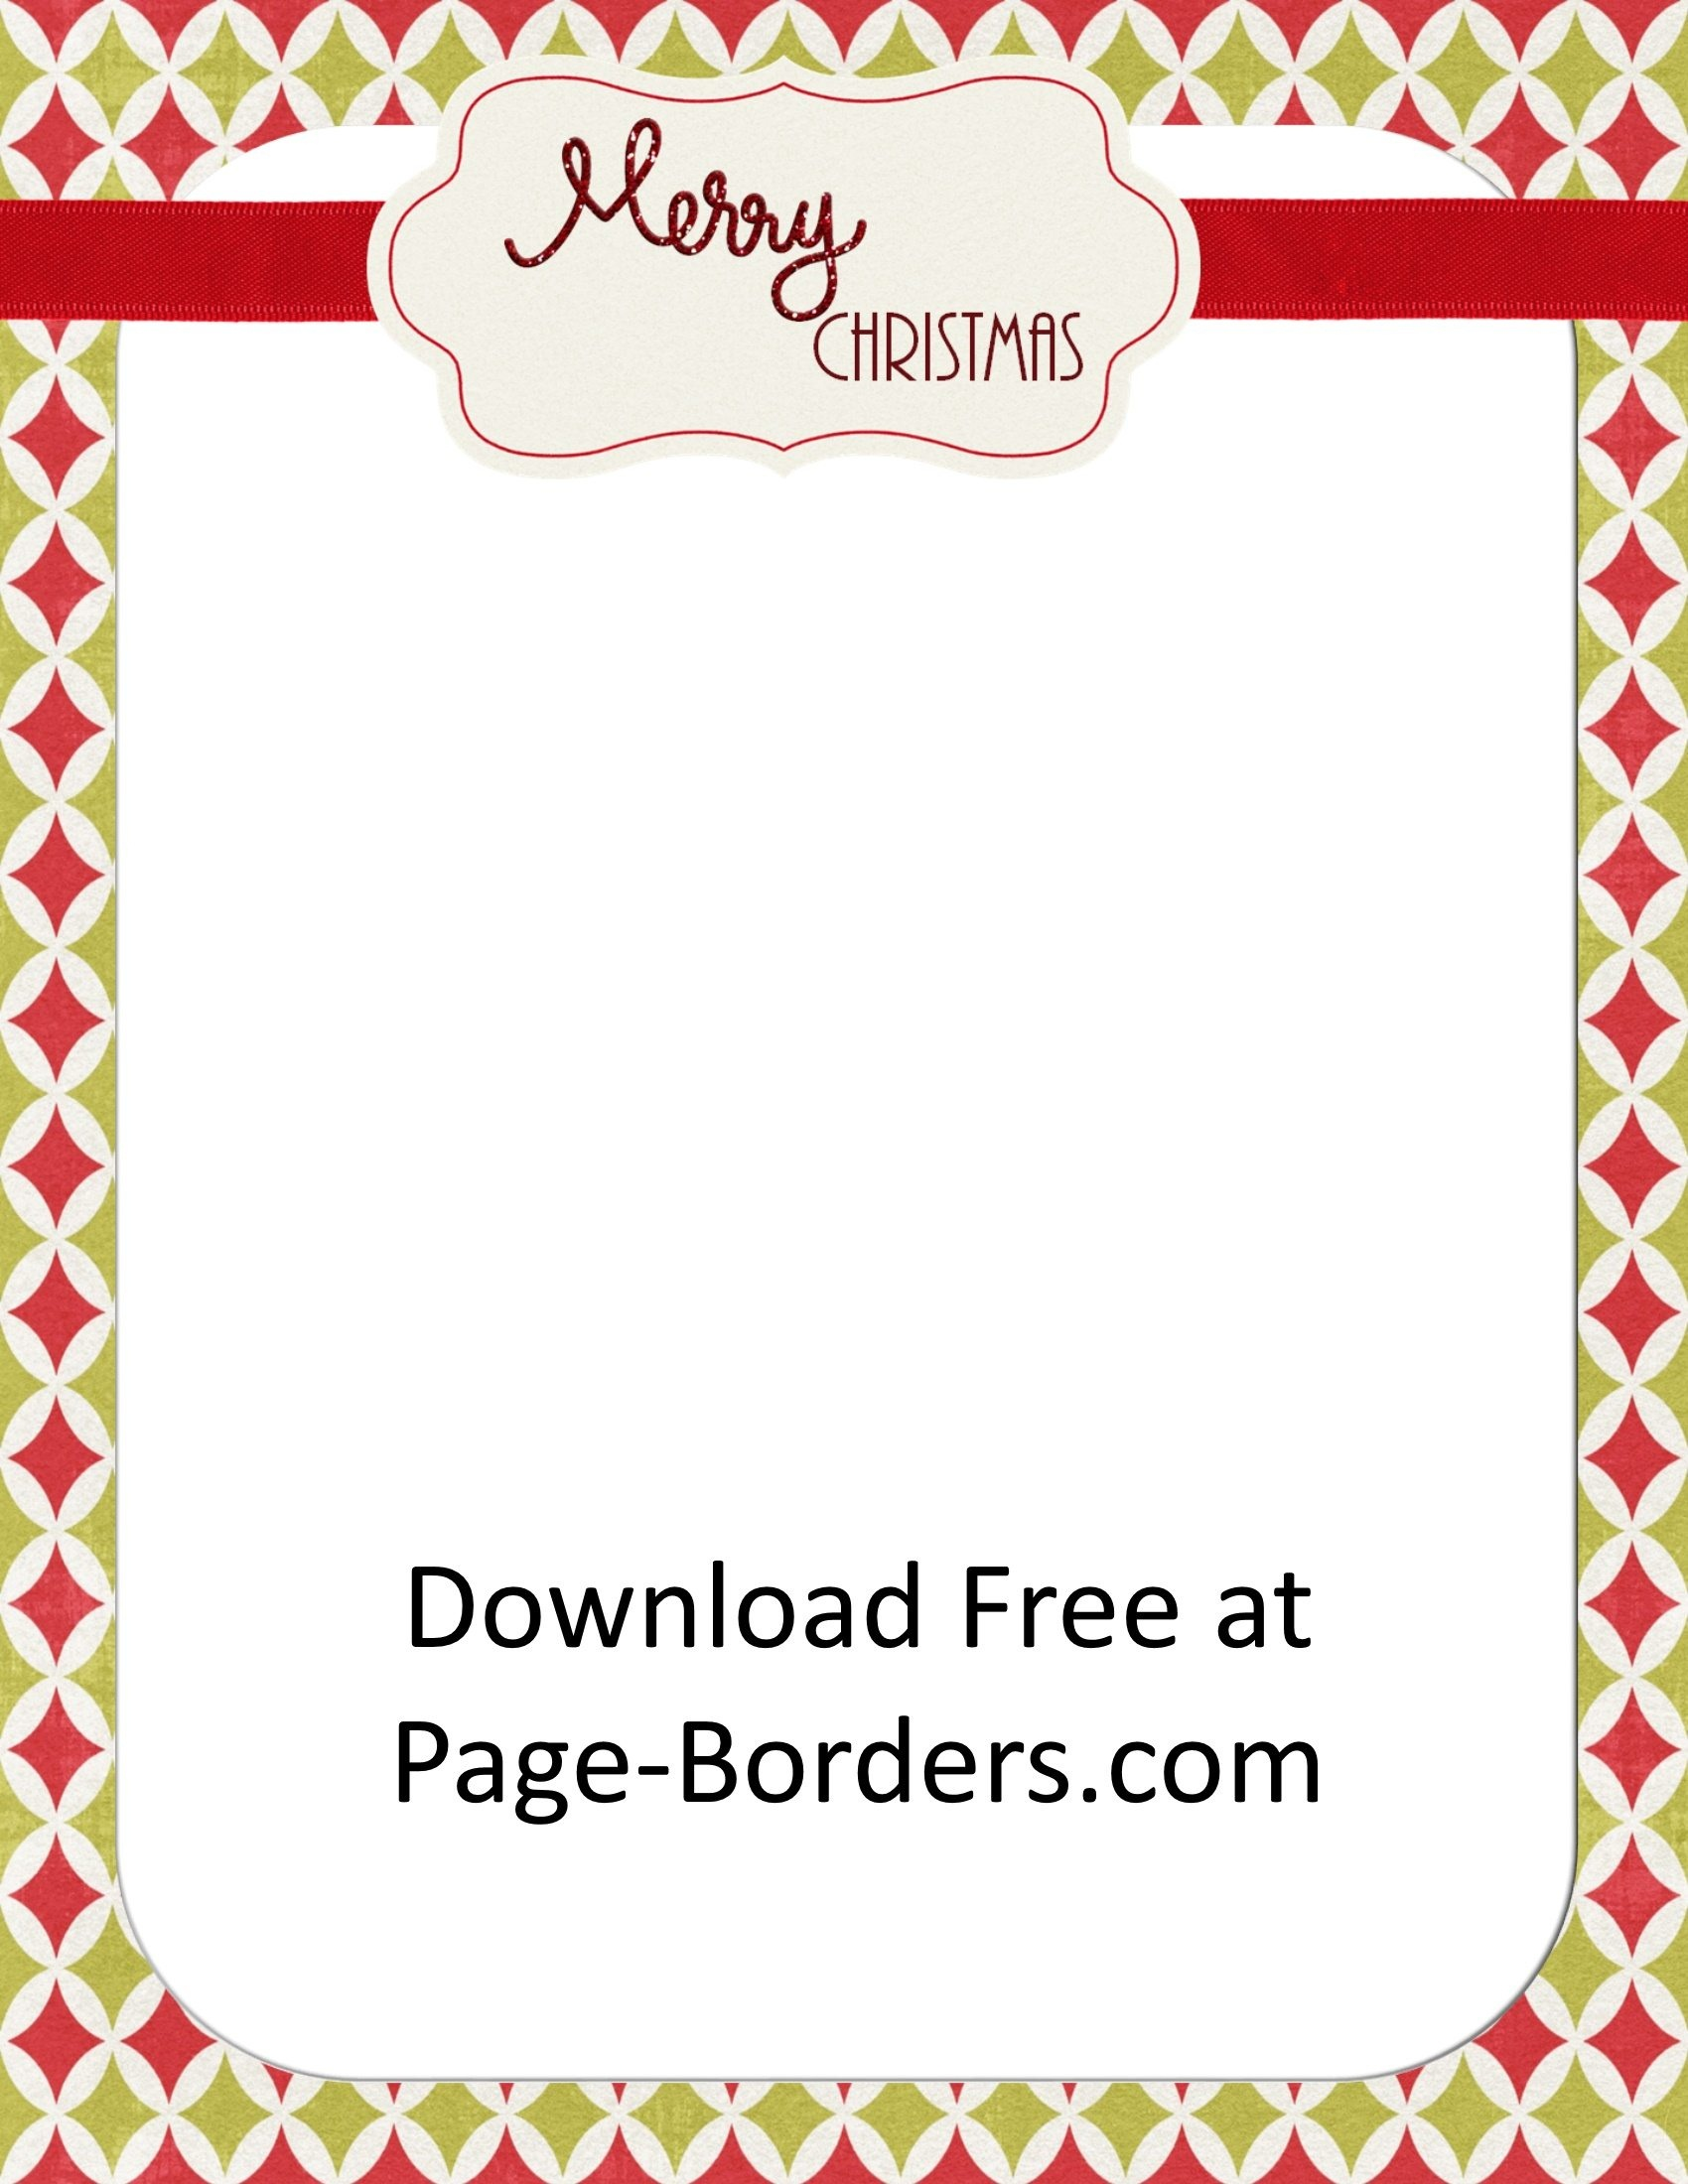 Free Christmas Border | Customize Online | Personal & Commercial Use - Free Printable Christmas Border Paper